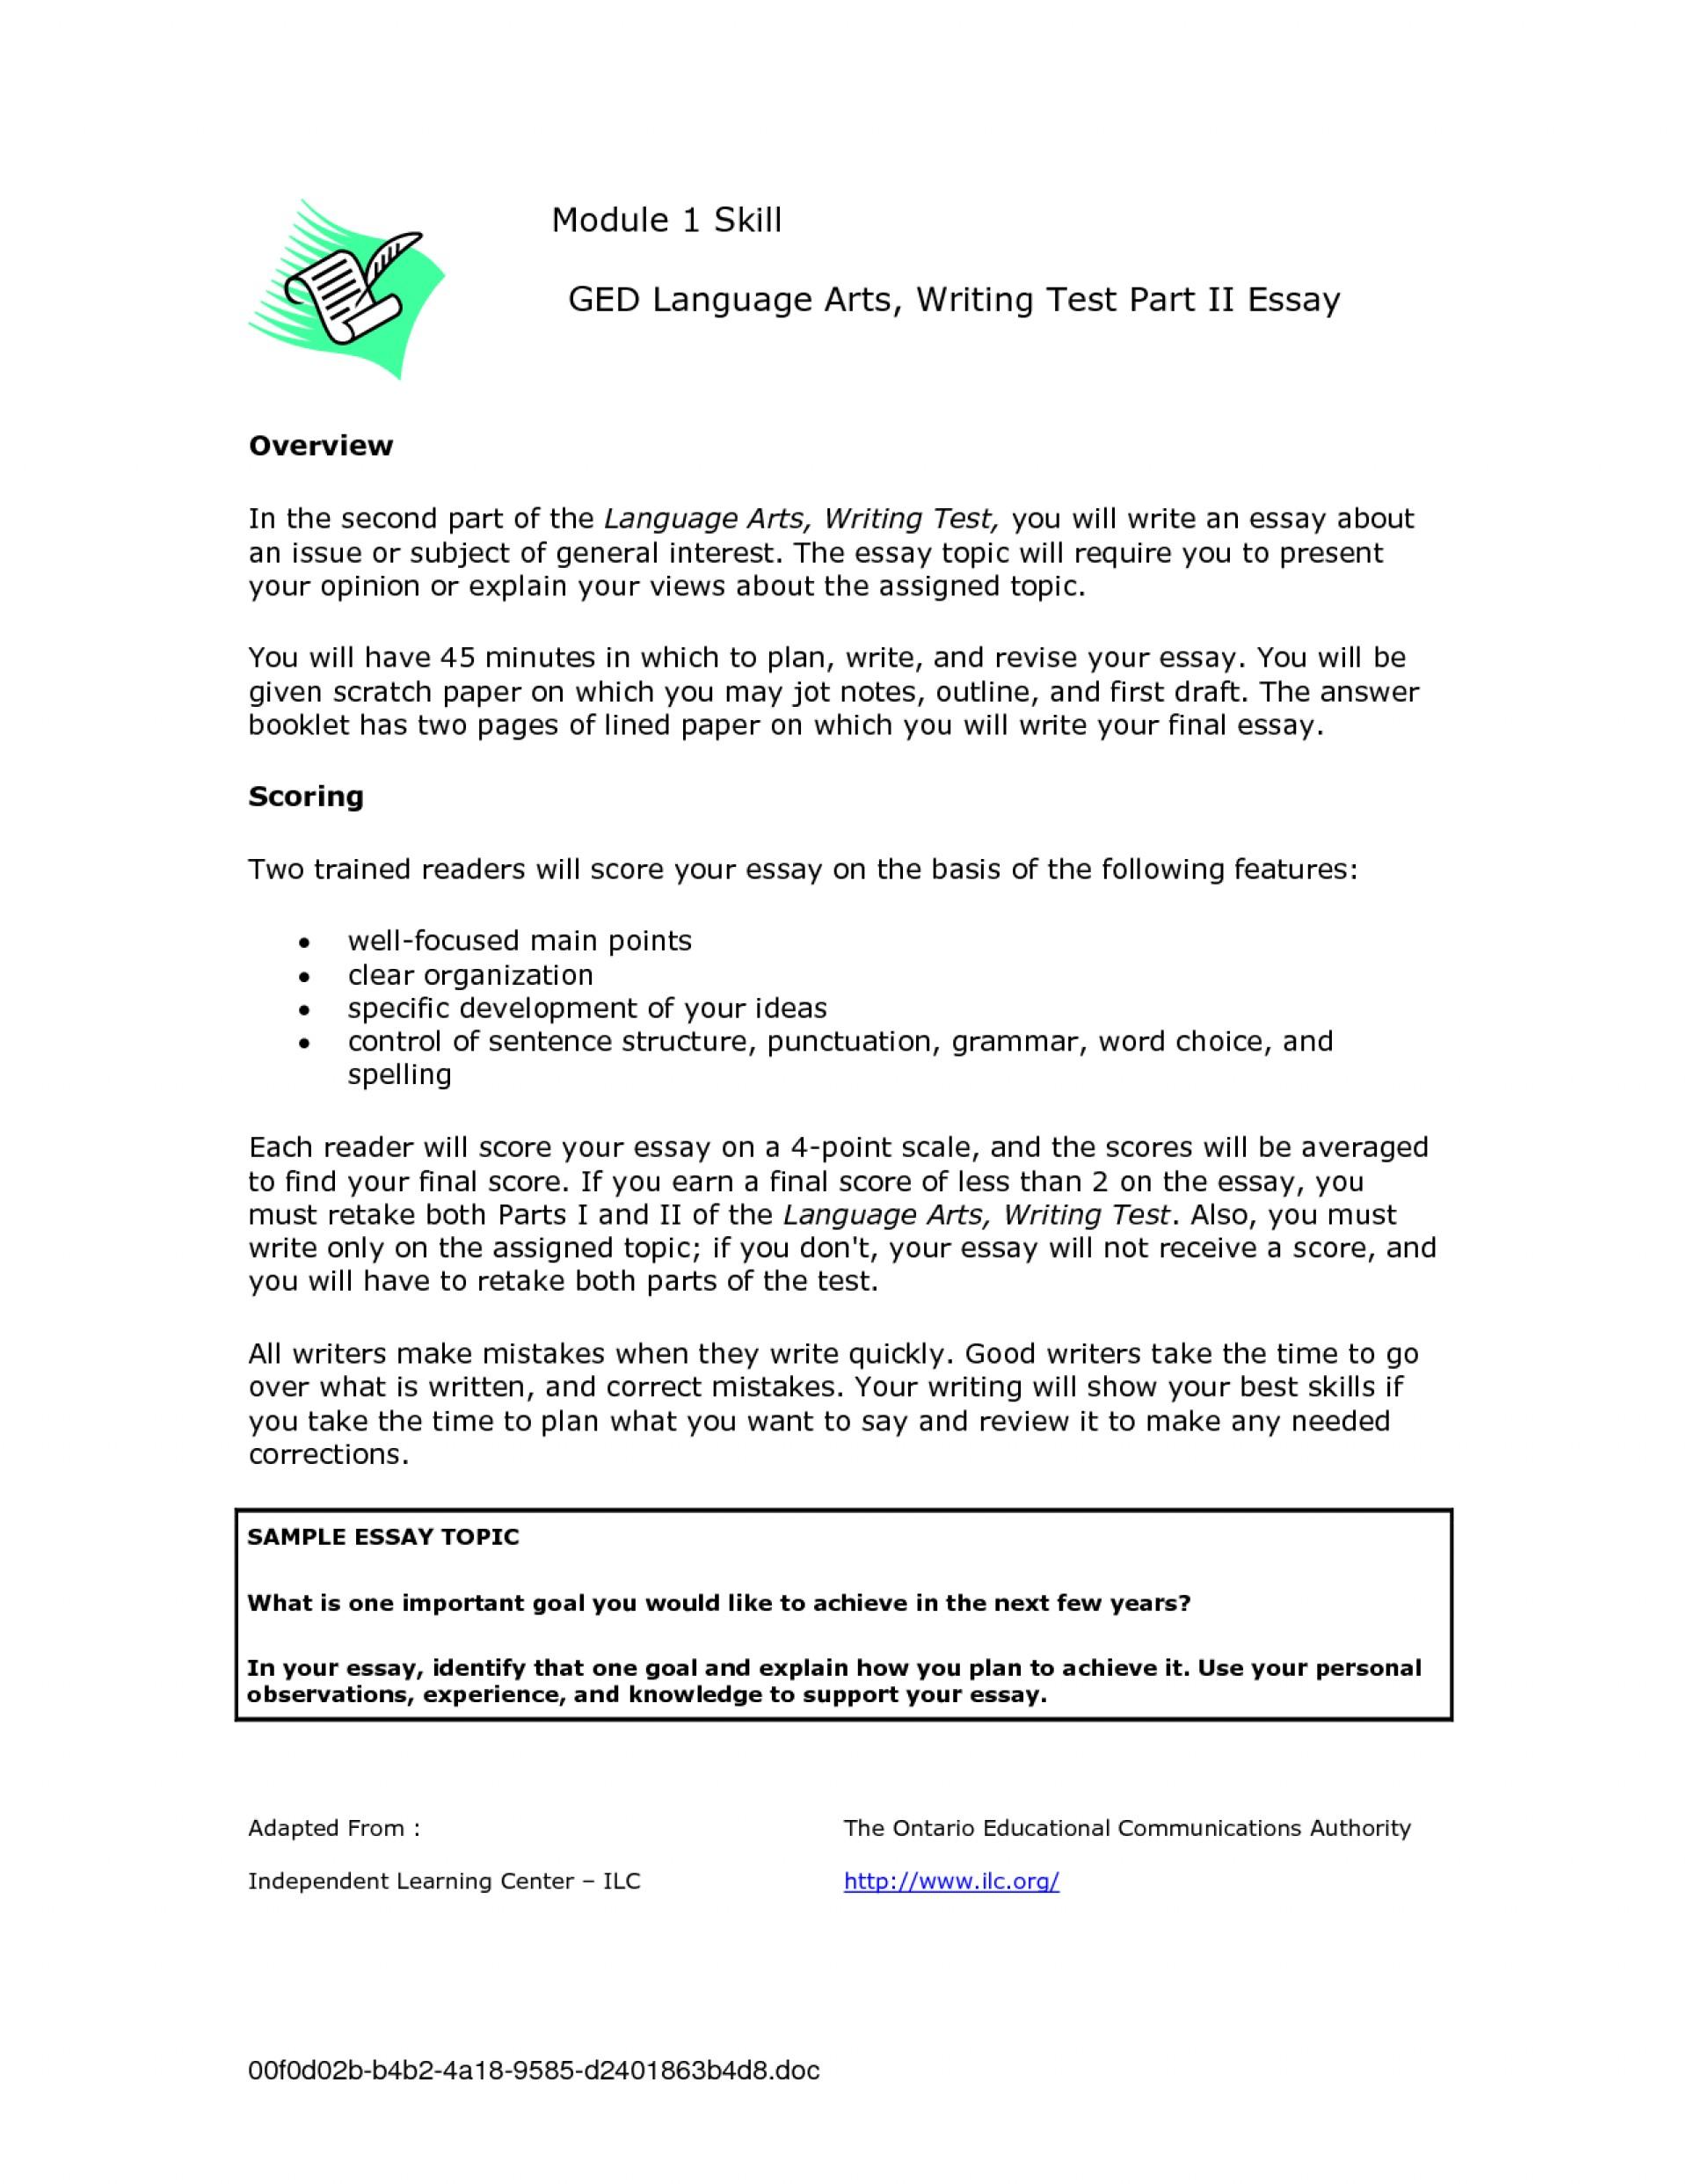 005 Ged Essay Topics Writing Test Samples 109105 Stirring List Examples Pdf 1920